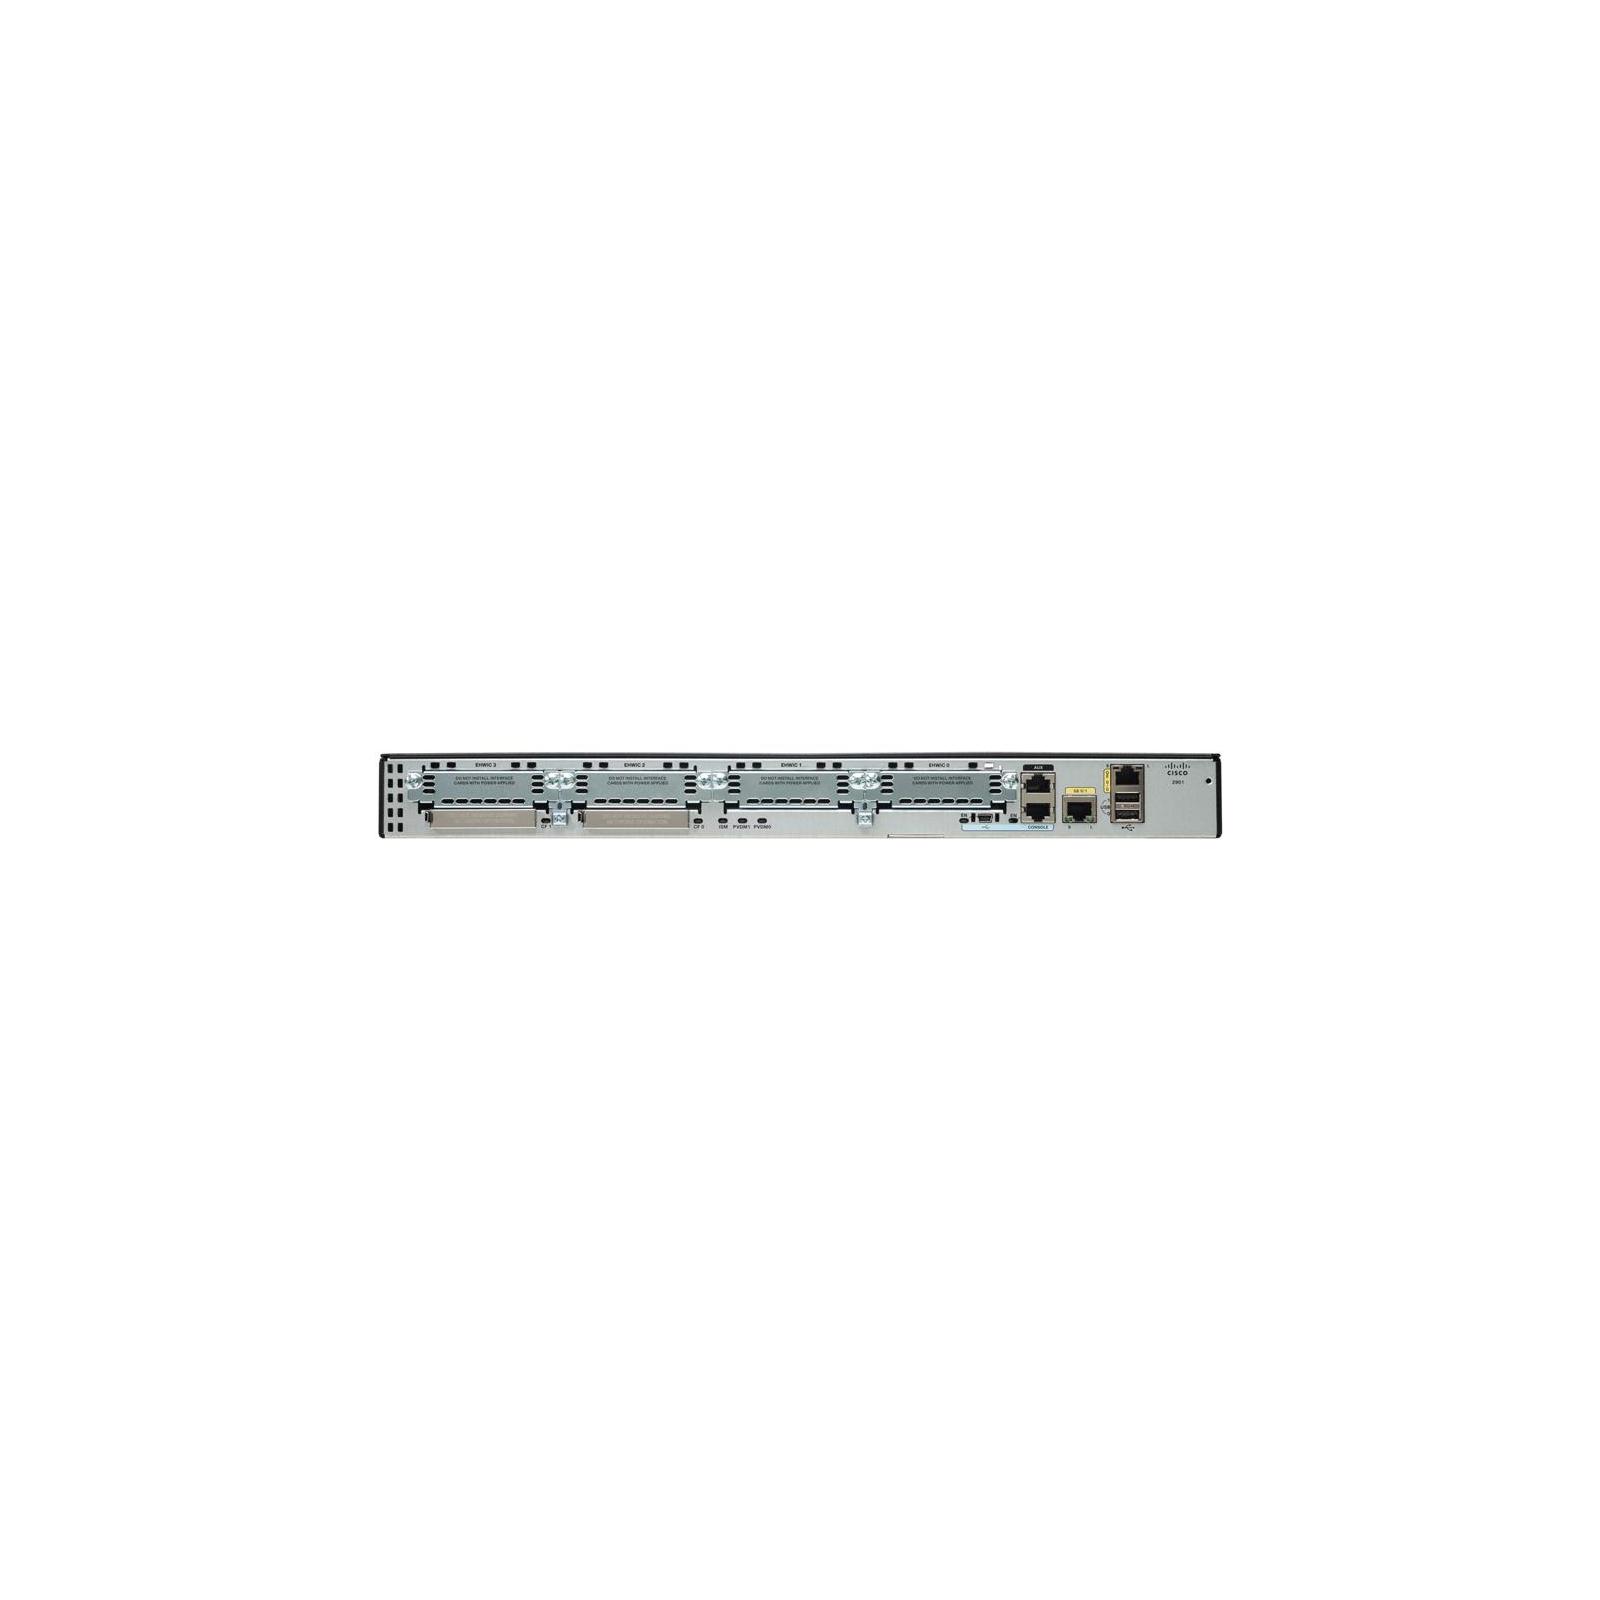 Маршрутизатор Cisco CISCO2901 (C2901-VSEC/K9) изображение 2